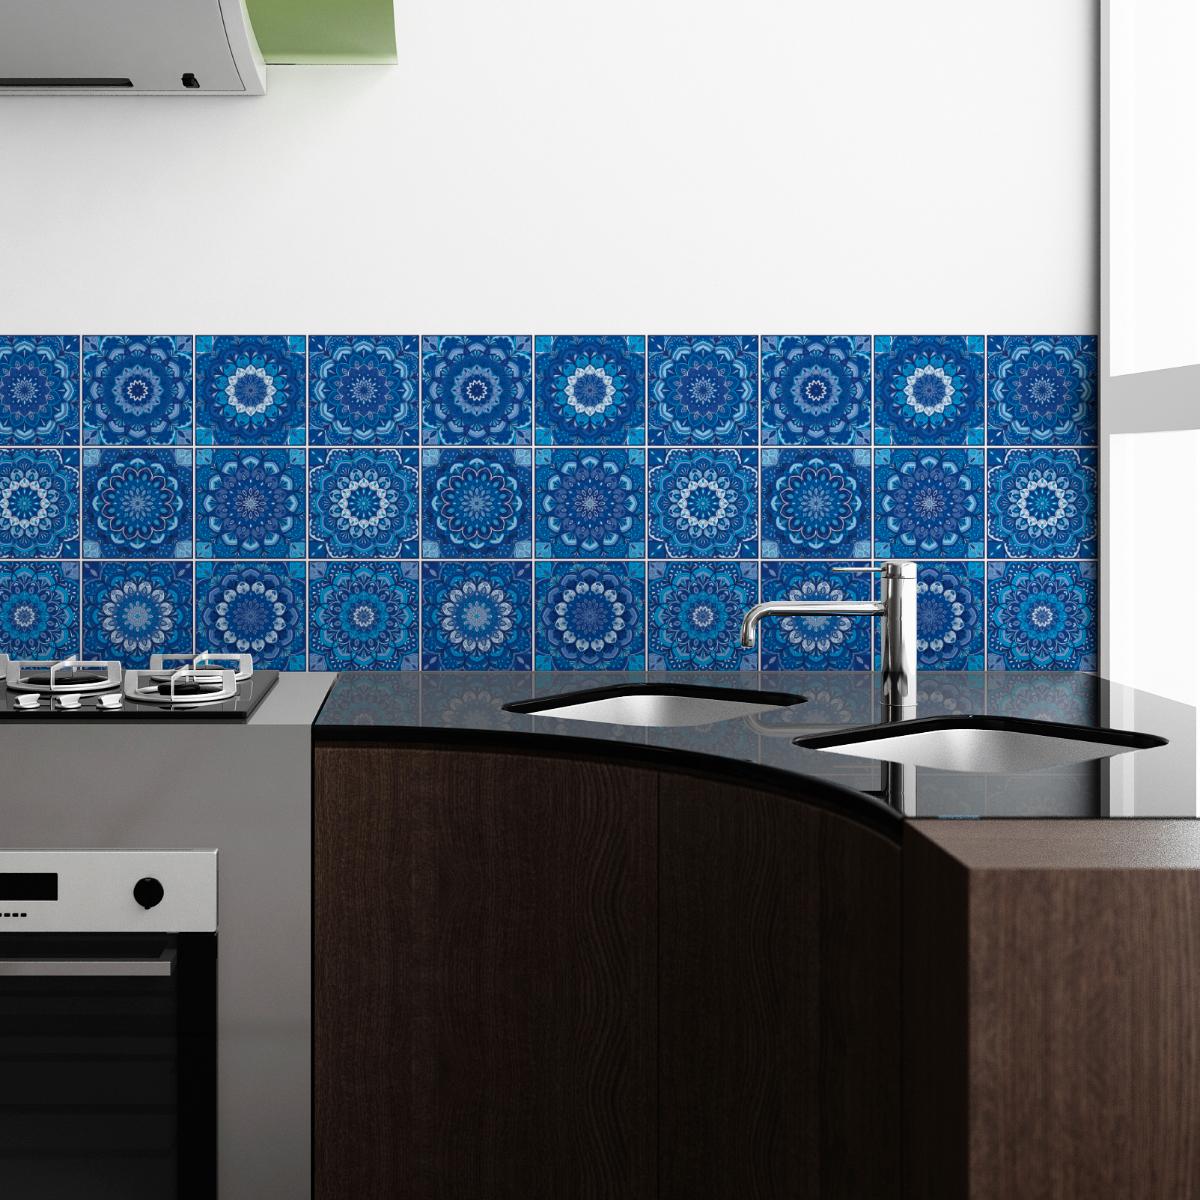 9 stickers carreaux de ciment boh me ollin cuisine - Stickers cuisine carrelage ...